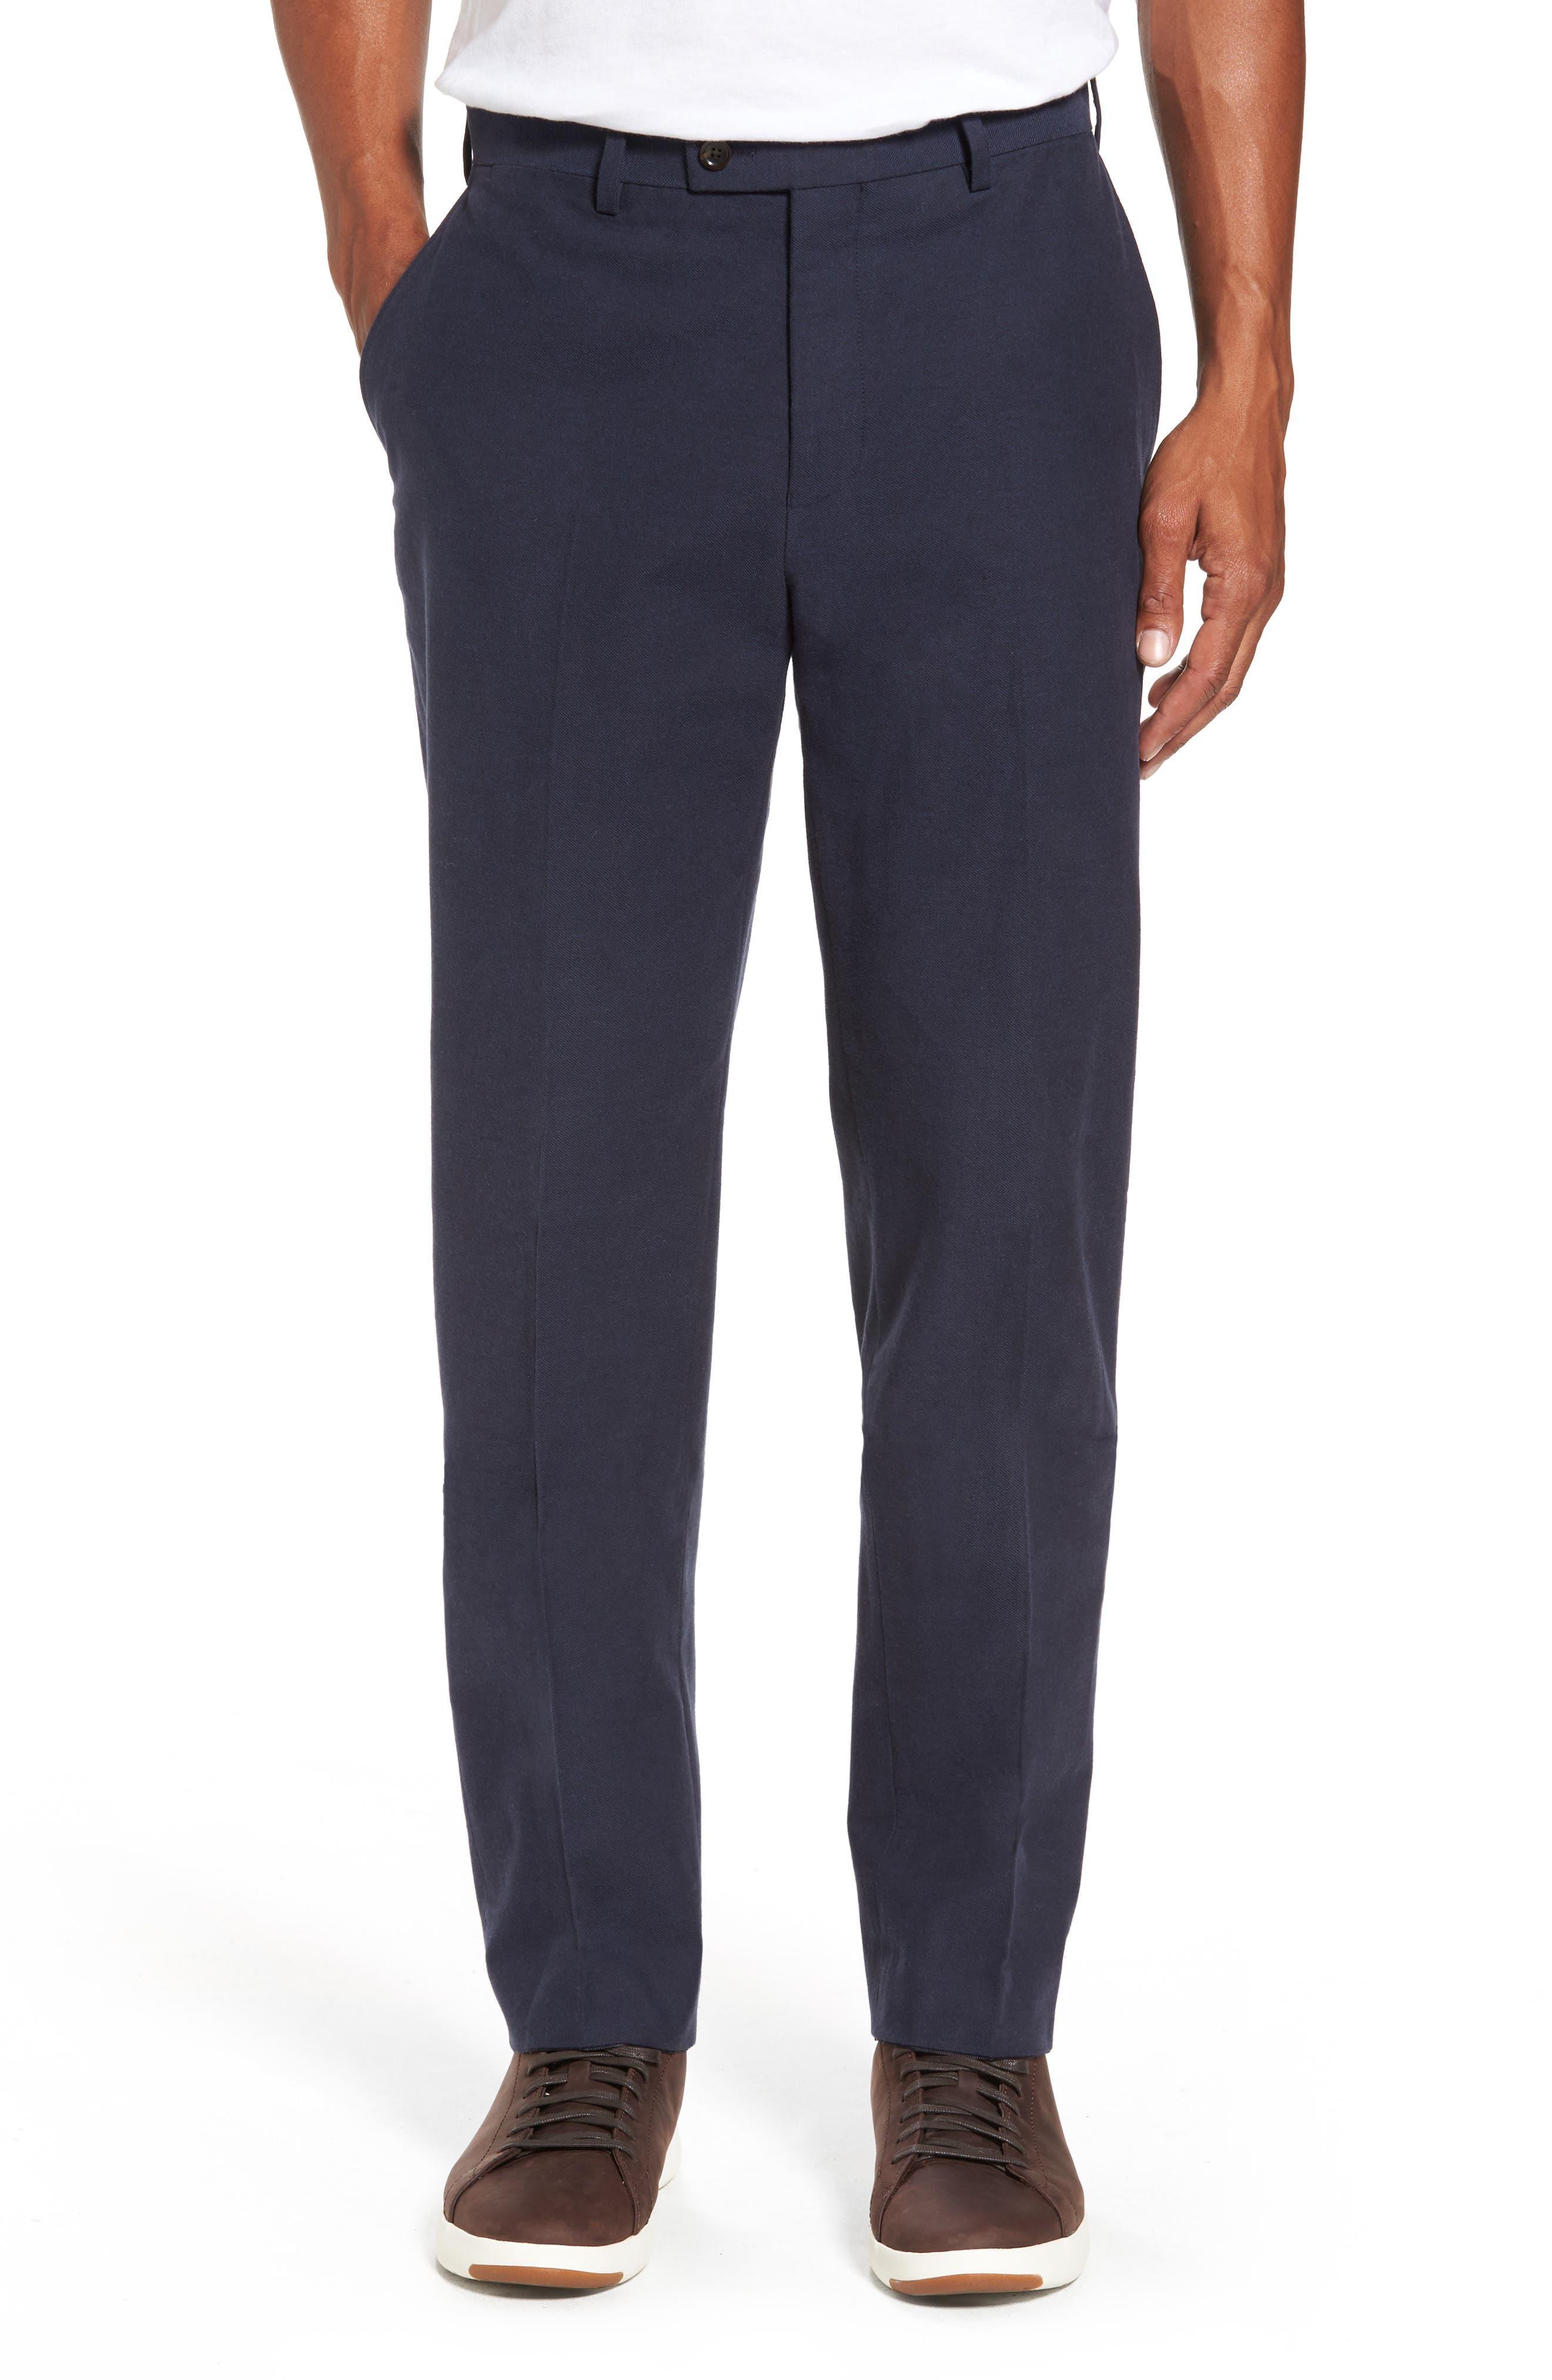 Alternate Image 1 Selected - Rodd & Gunn Pembroke Slim Fit Twill Pants